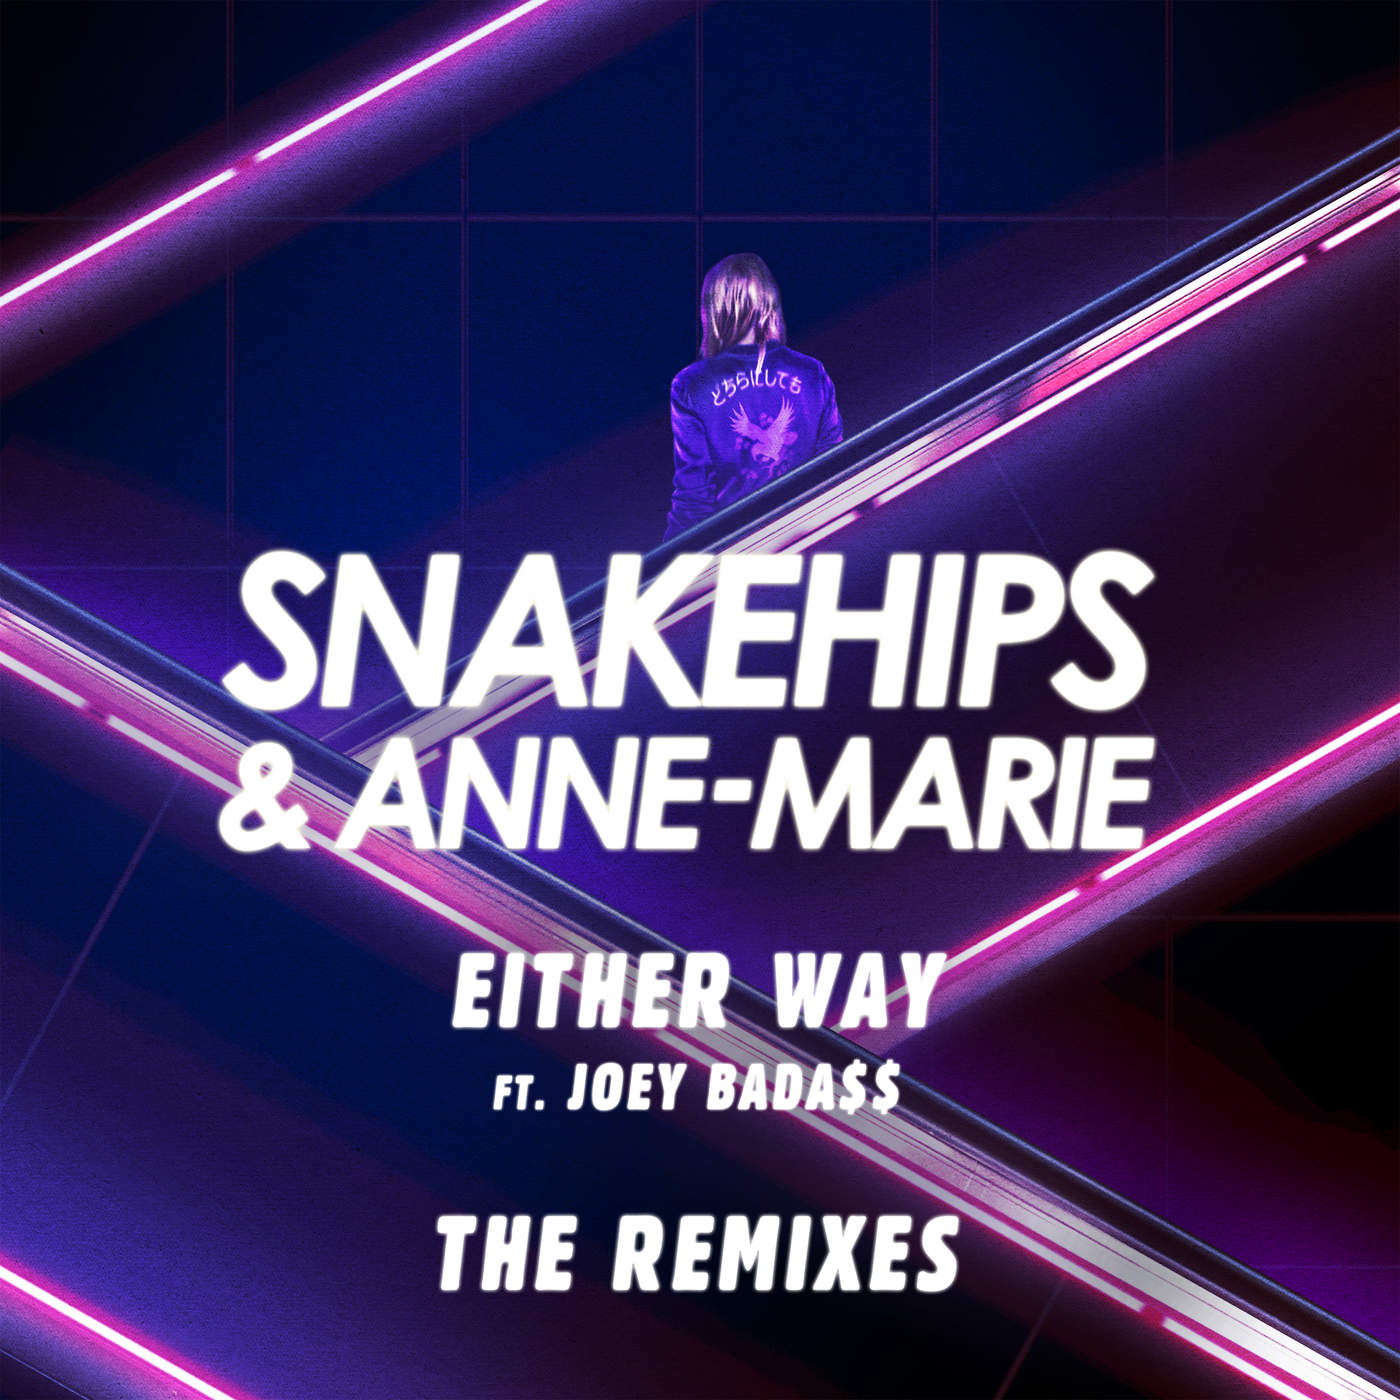 Snakehips - Either Way (feat. Joey Bada$$) [The Remixes] - Single